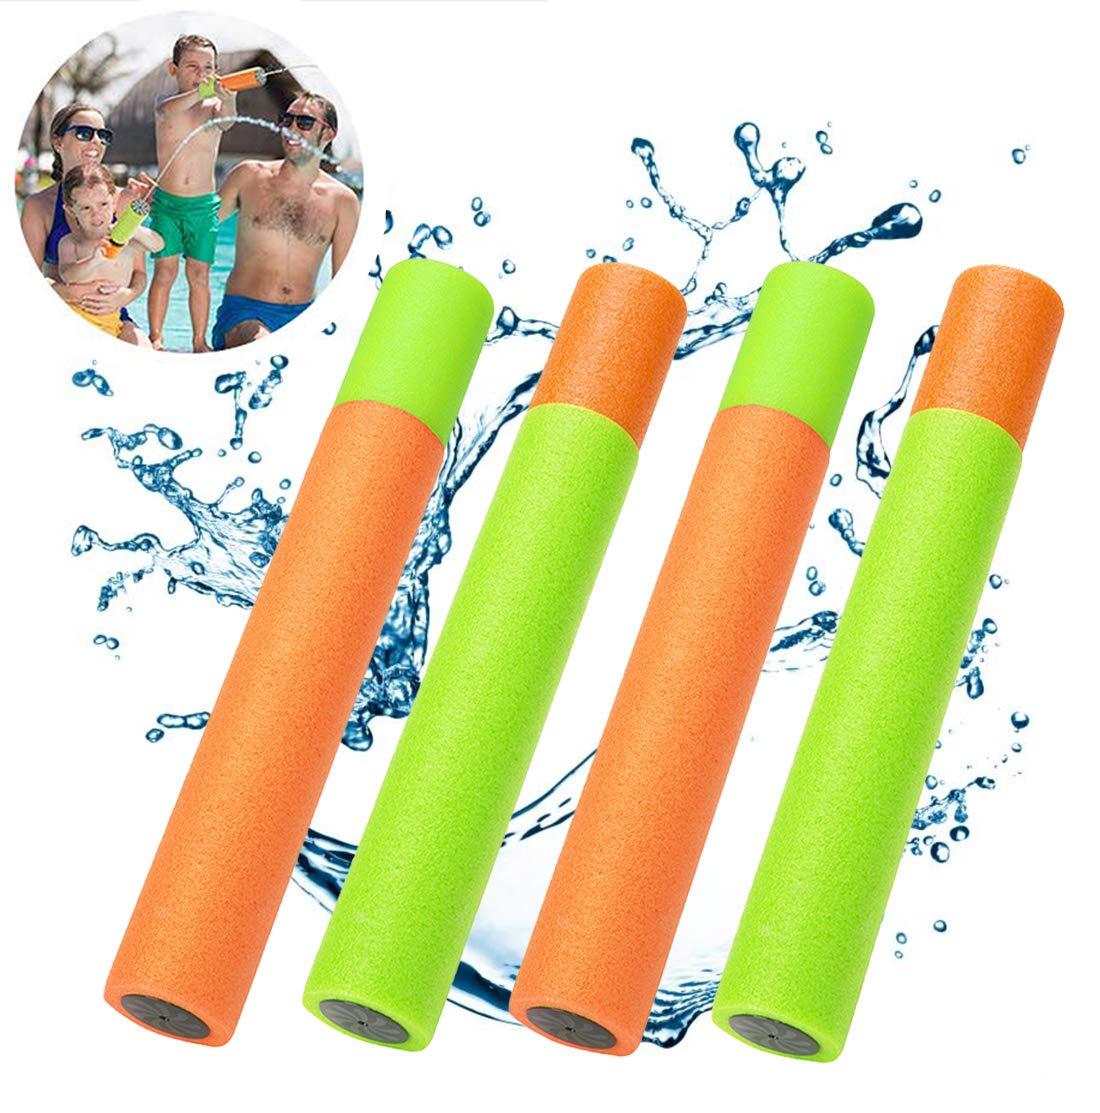 2 PC קצף מים אקדח בריכת אביזרי ילדי קיץ Blaster Shooter שחייה משחק ילדים חיצוני חוף ספורט בריכת מים משחק